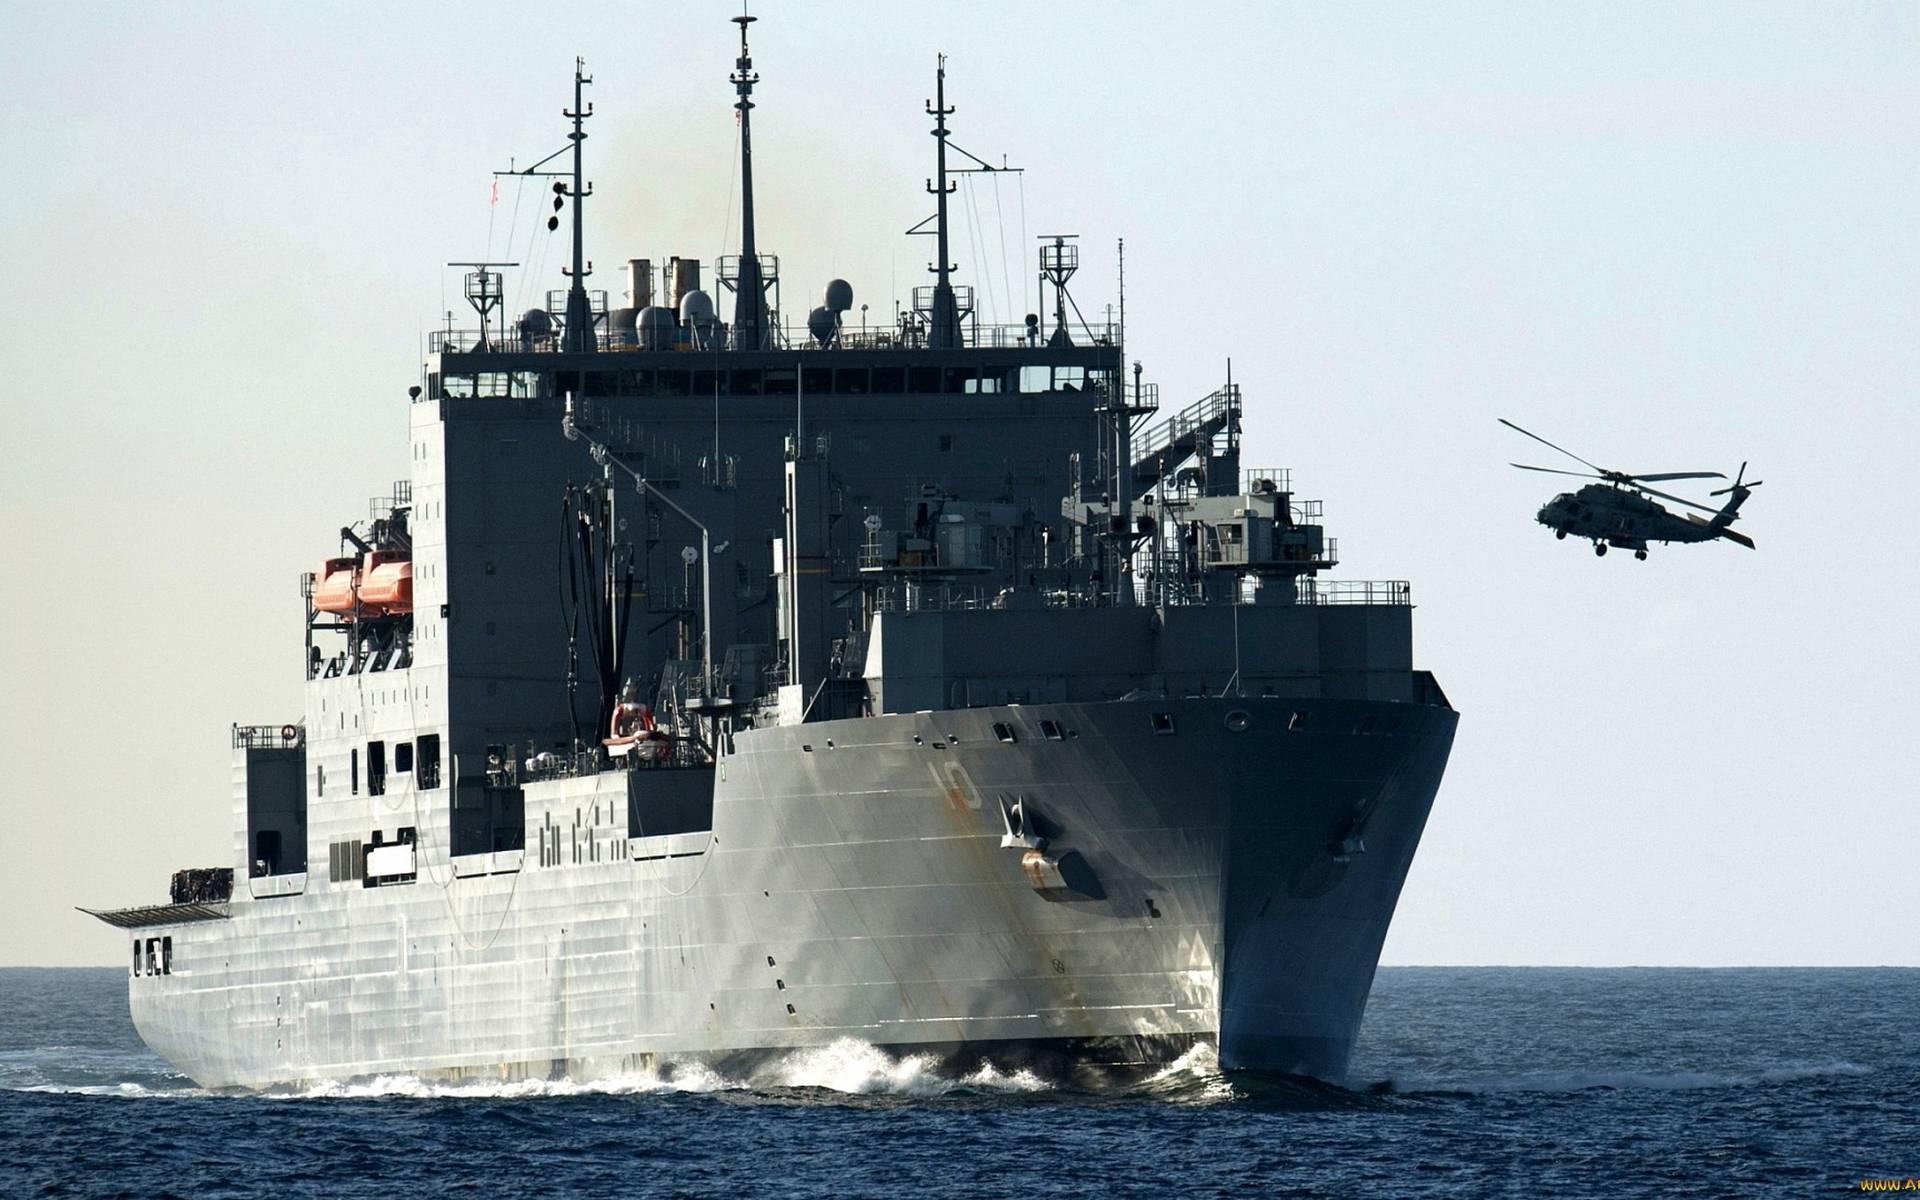 море, корабль, палуба